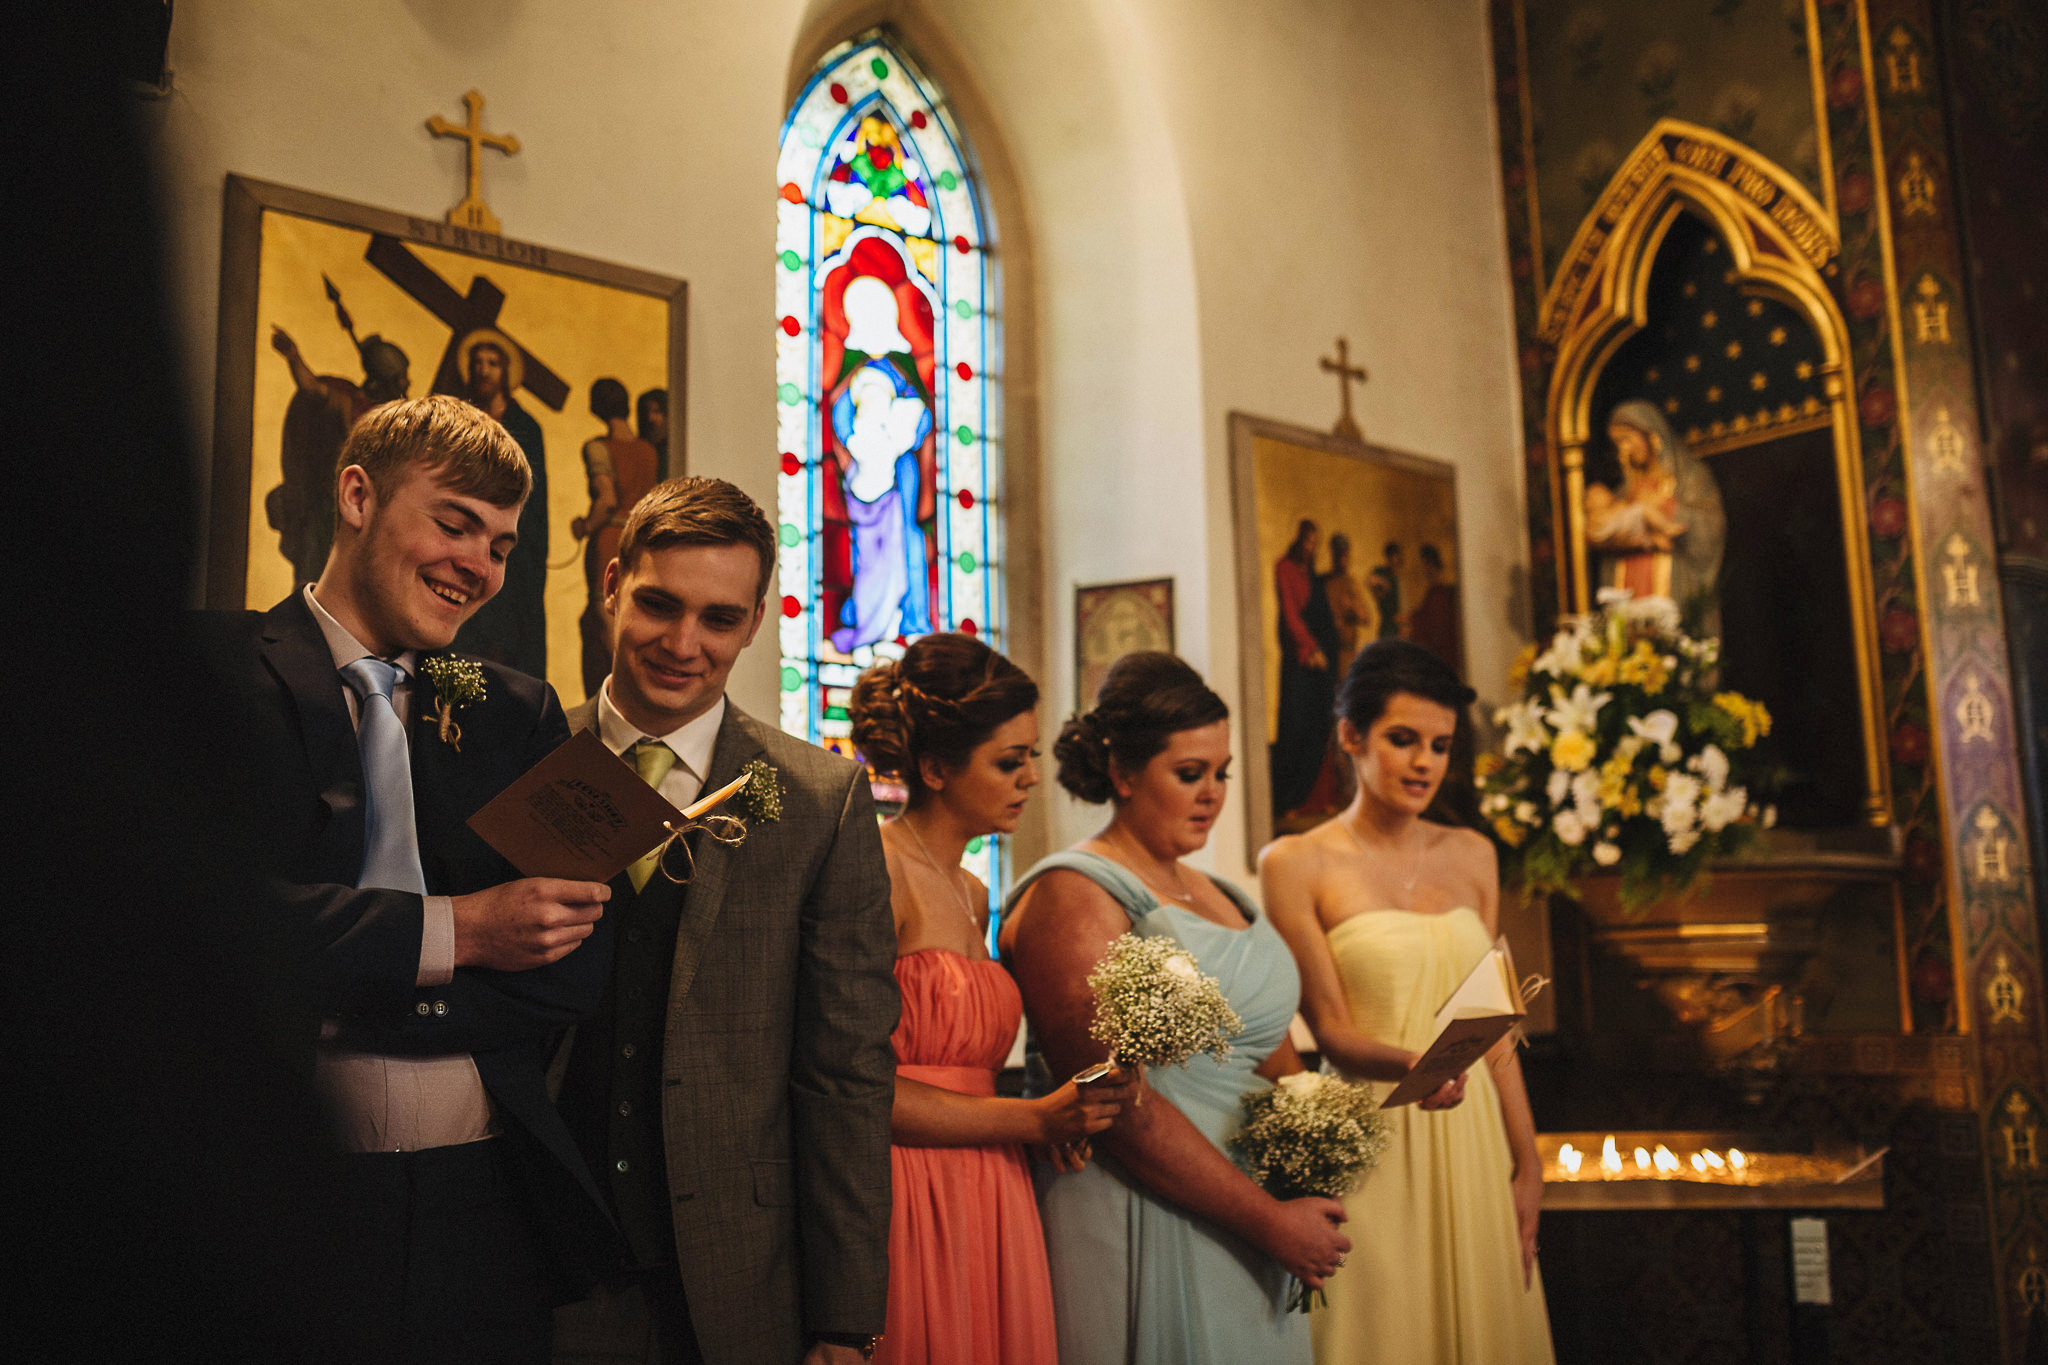 Lancashire-Creative-natural-documentary-wedding-photography-90041